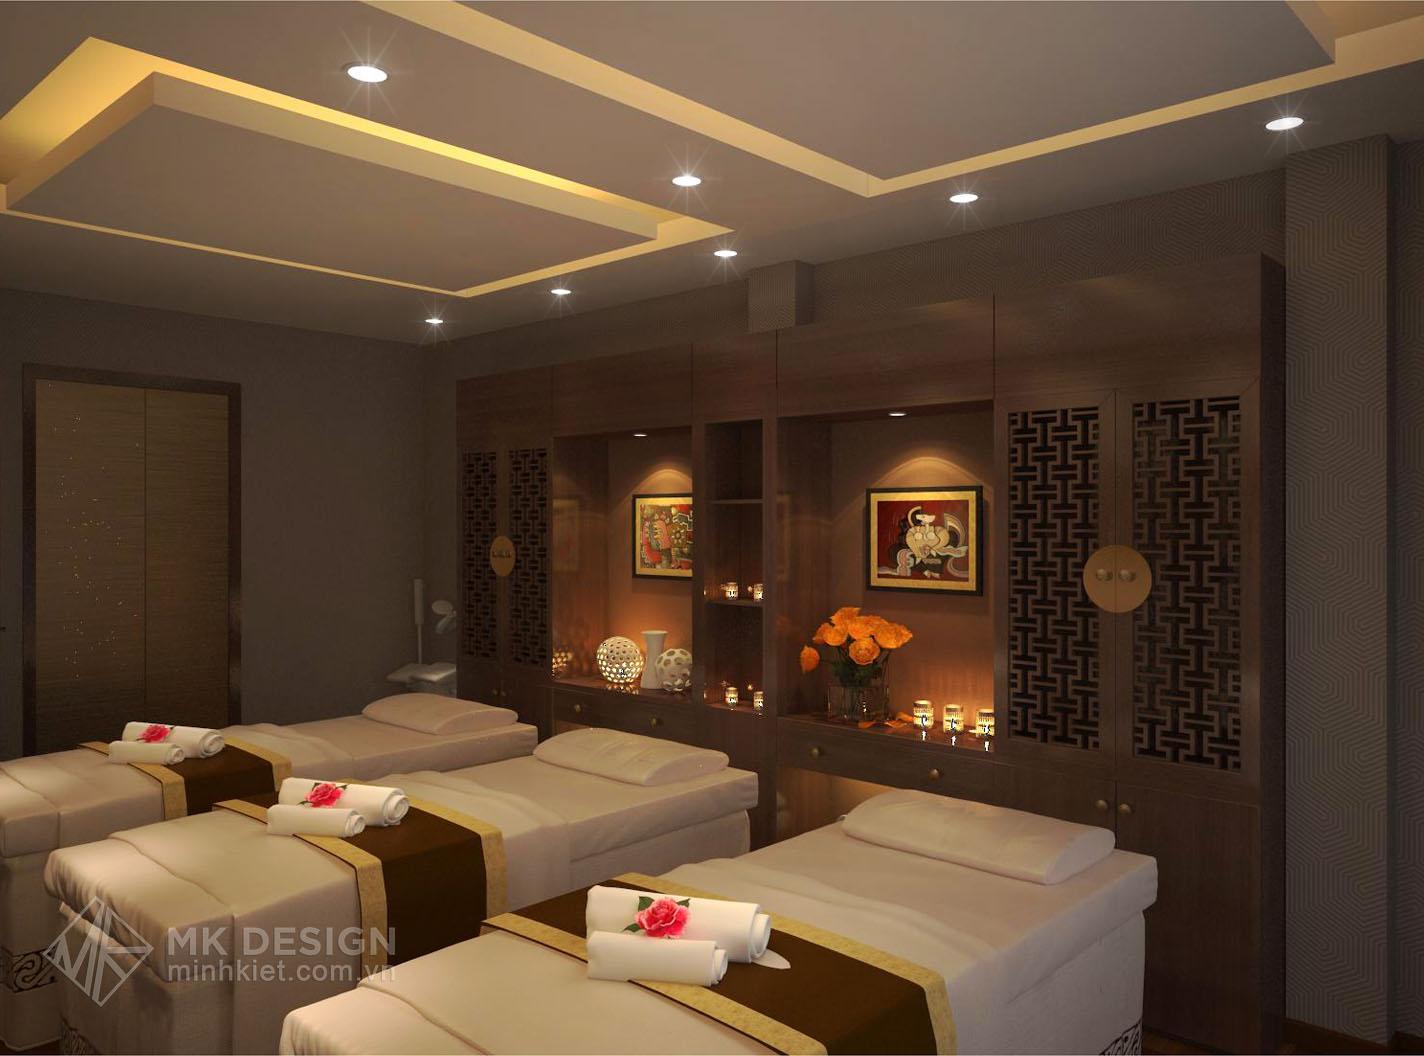 spa-Linh-Pham-Minh-Kiet-design16